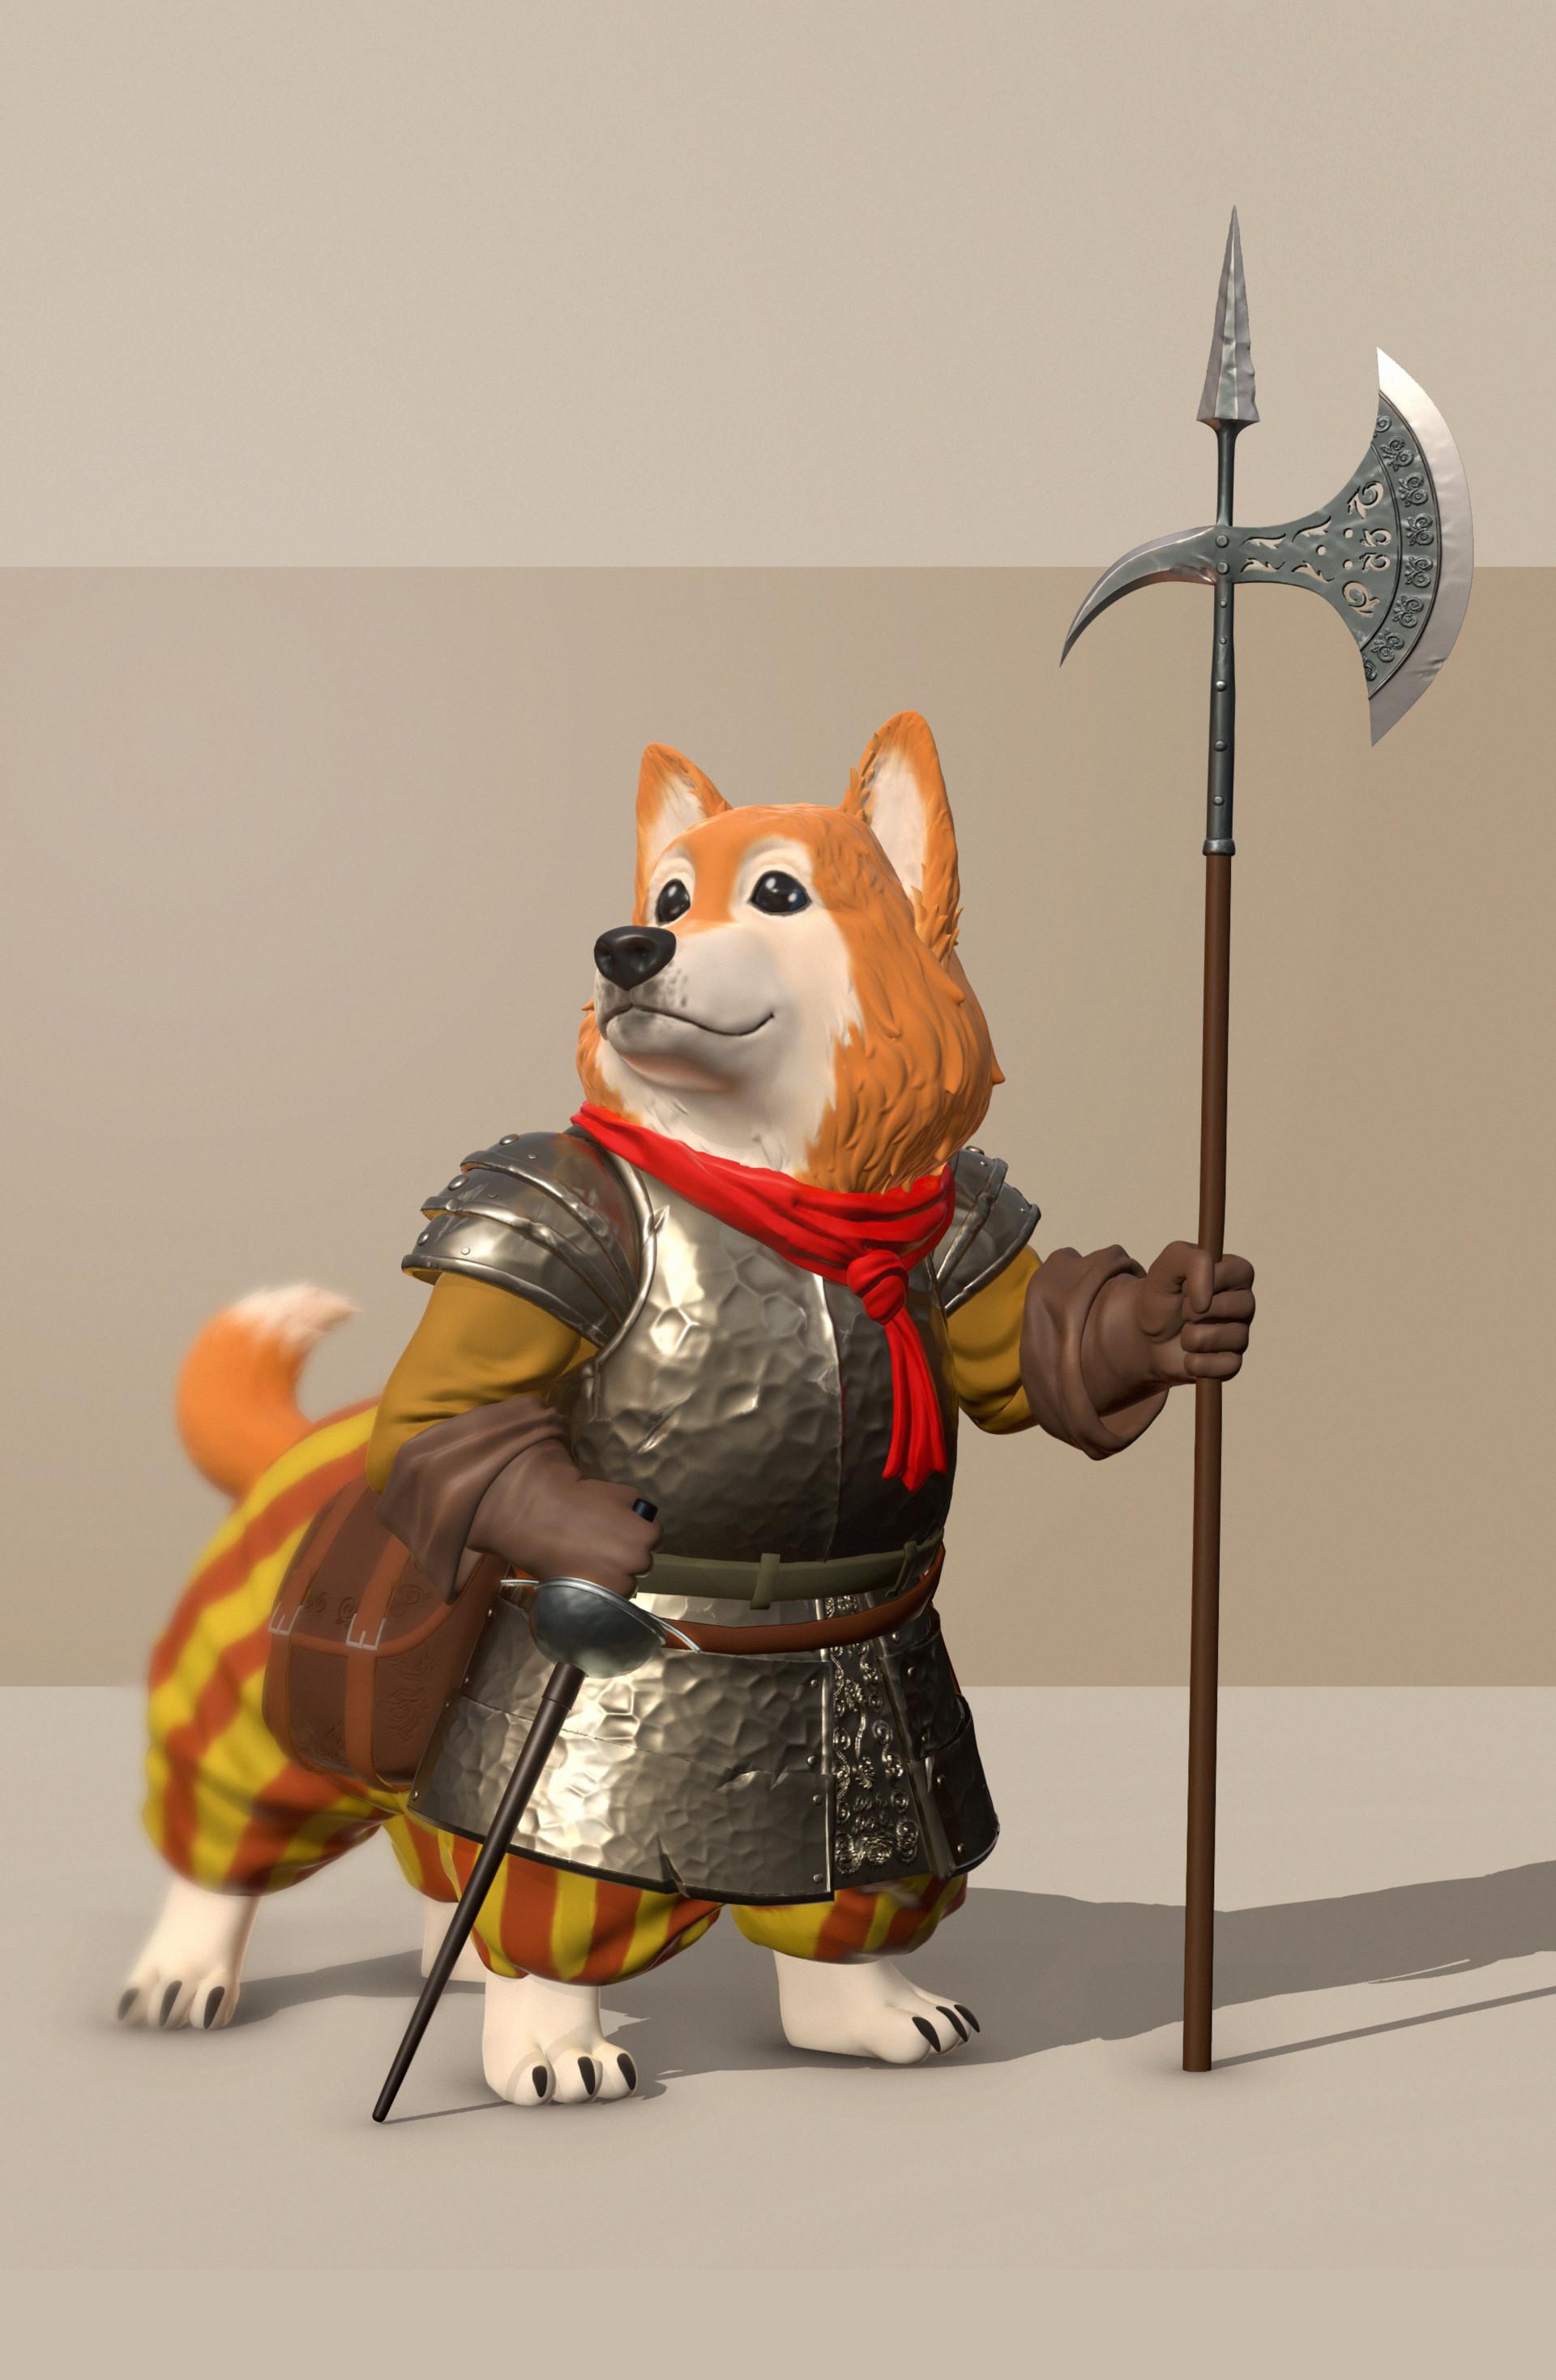 Corgi Knight| The Dogs of War